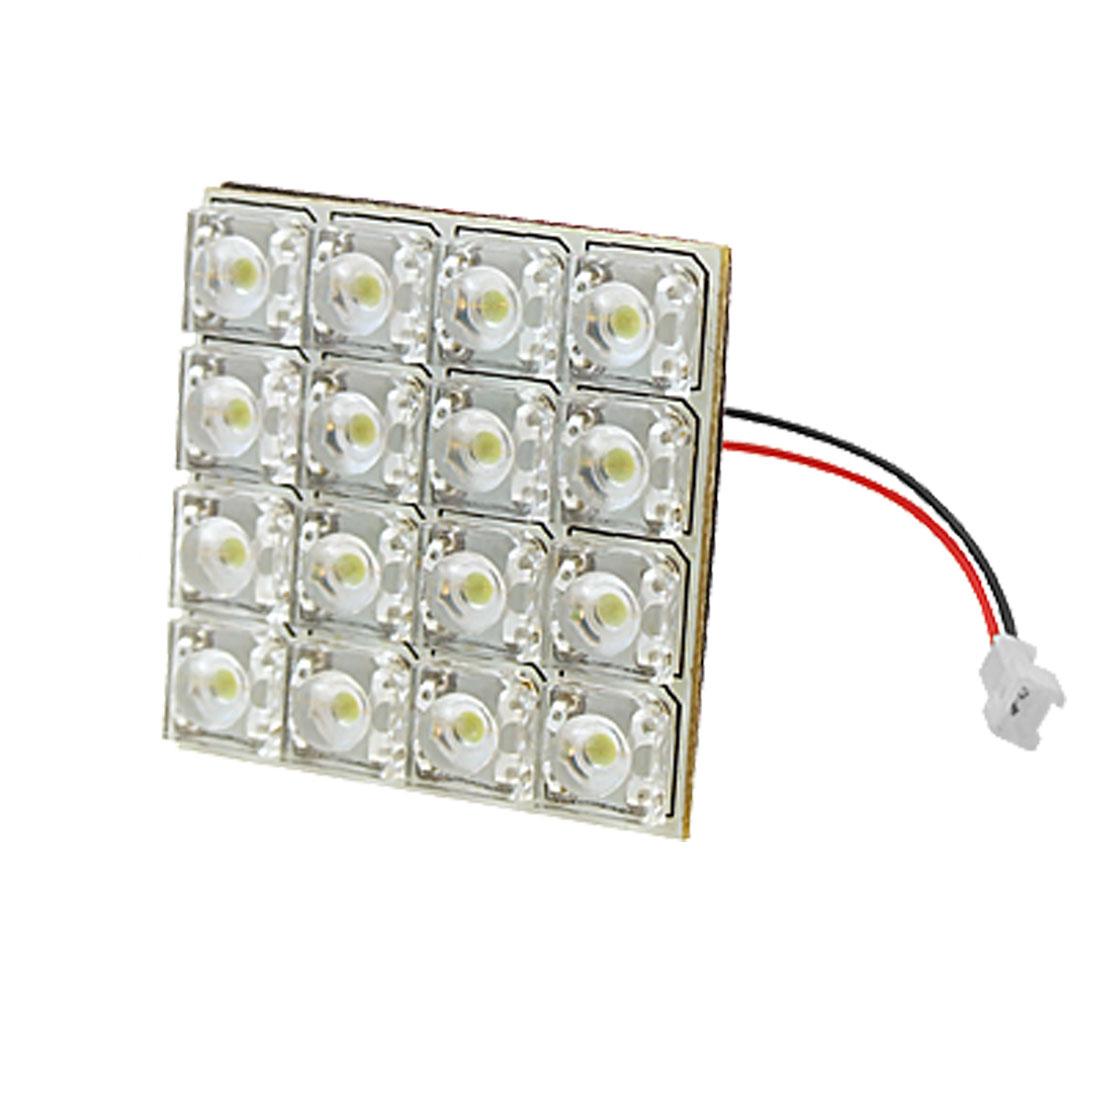 16 LED Auto Car Interior Dome/Door/Box Light Lamp Bulb